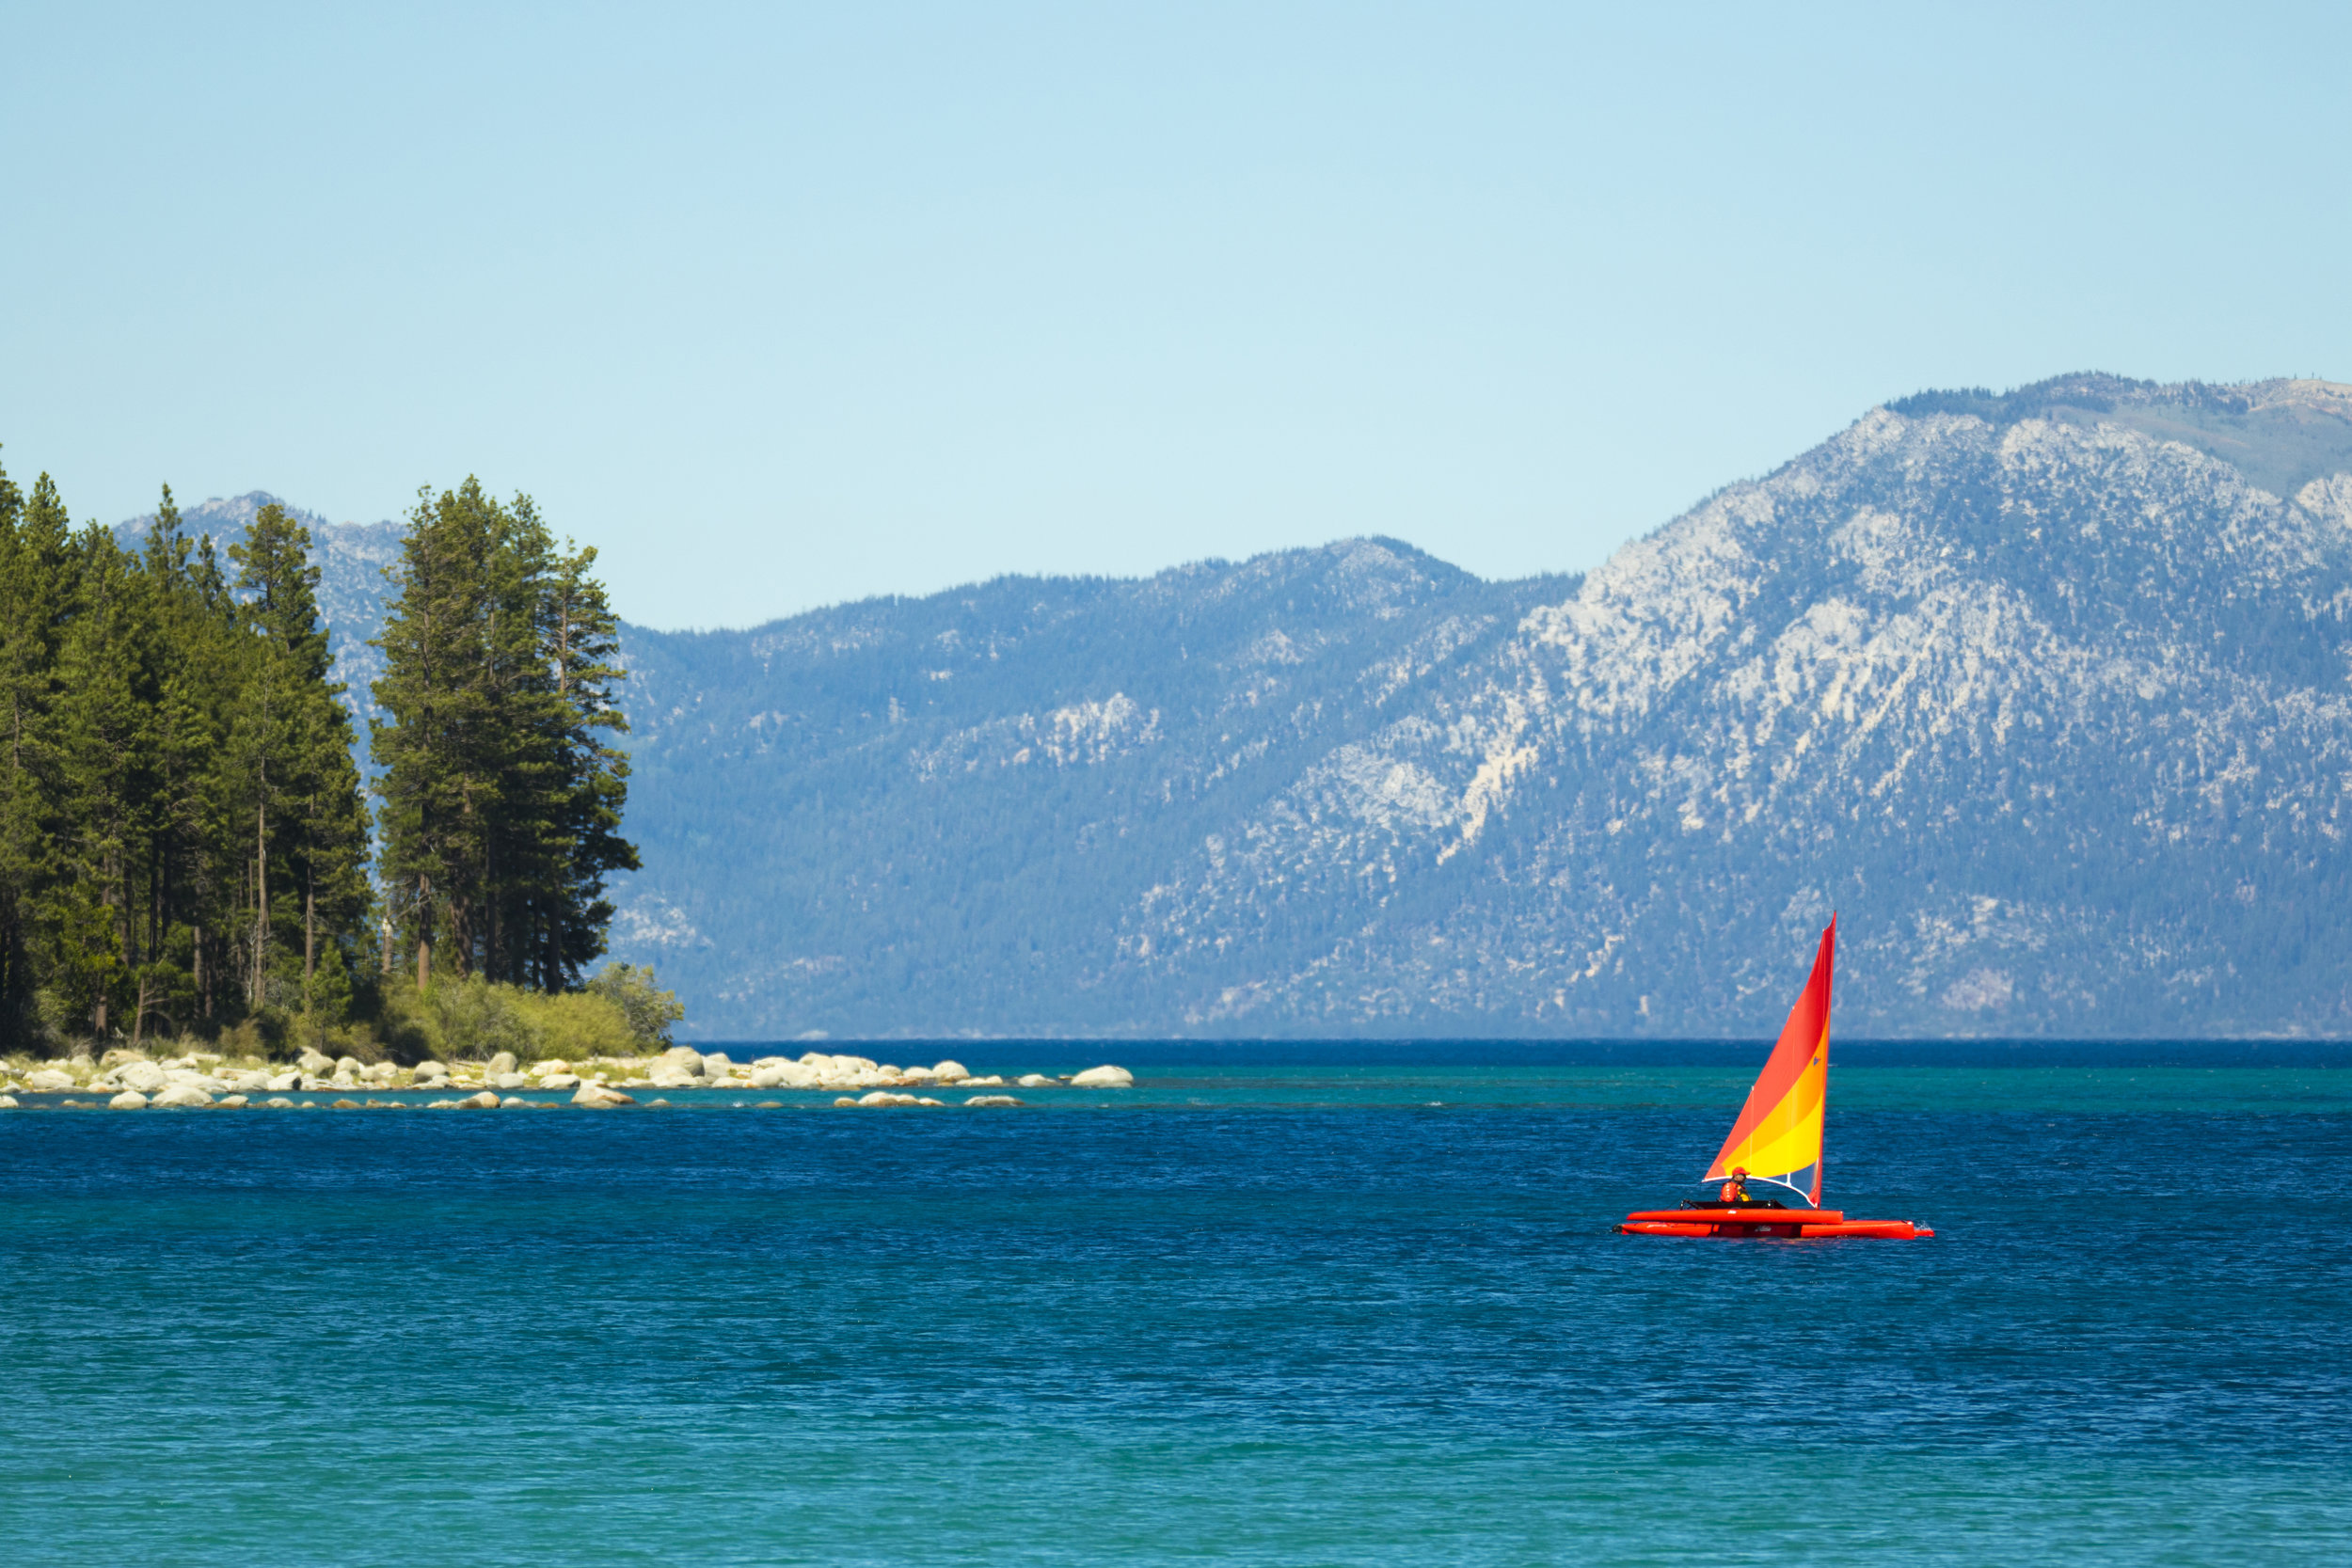 AdventureIsland_action_Tahoe_Red_point_2130_full.jpg